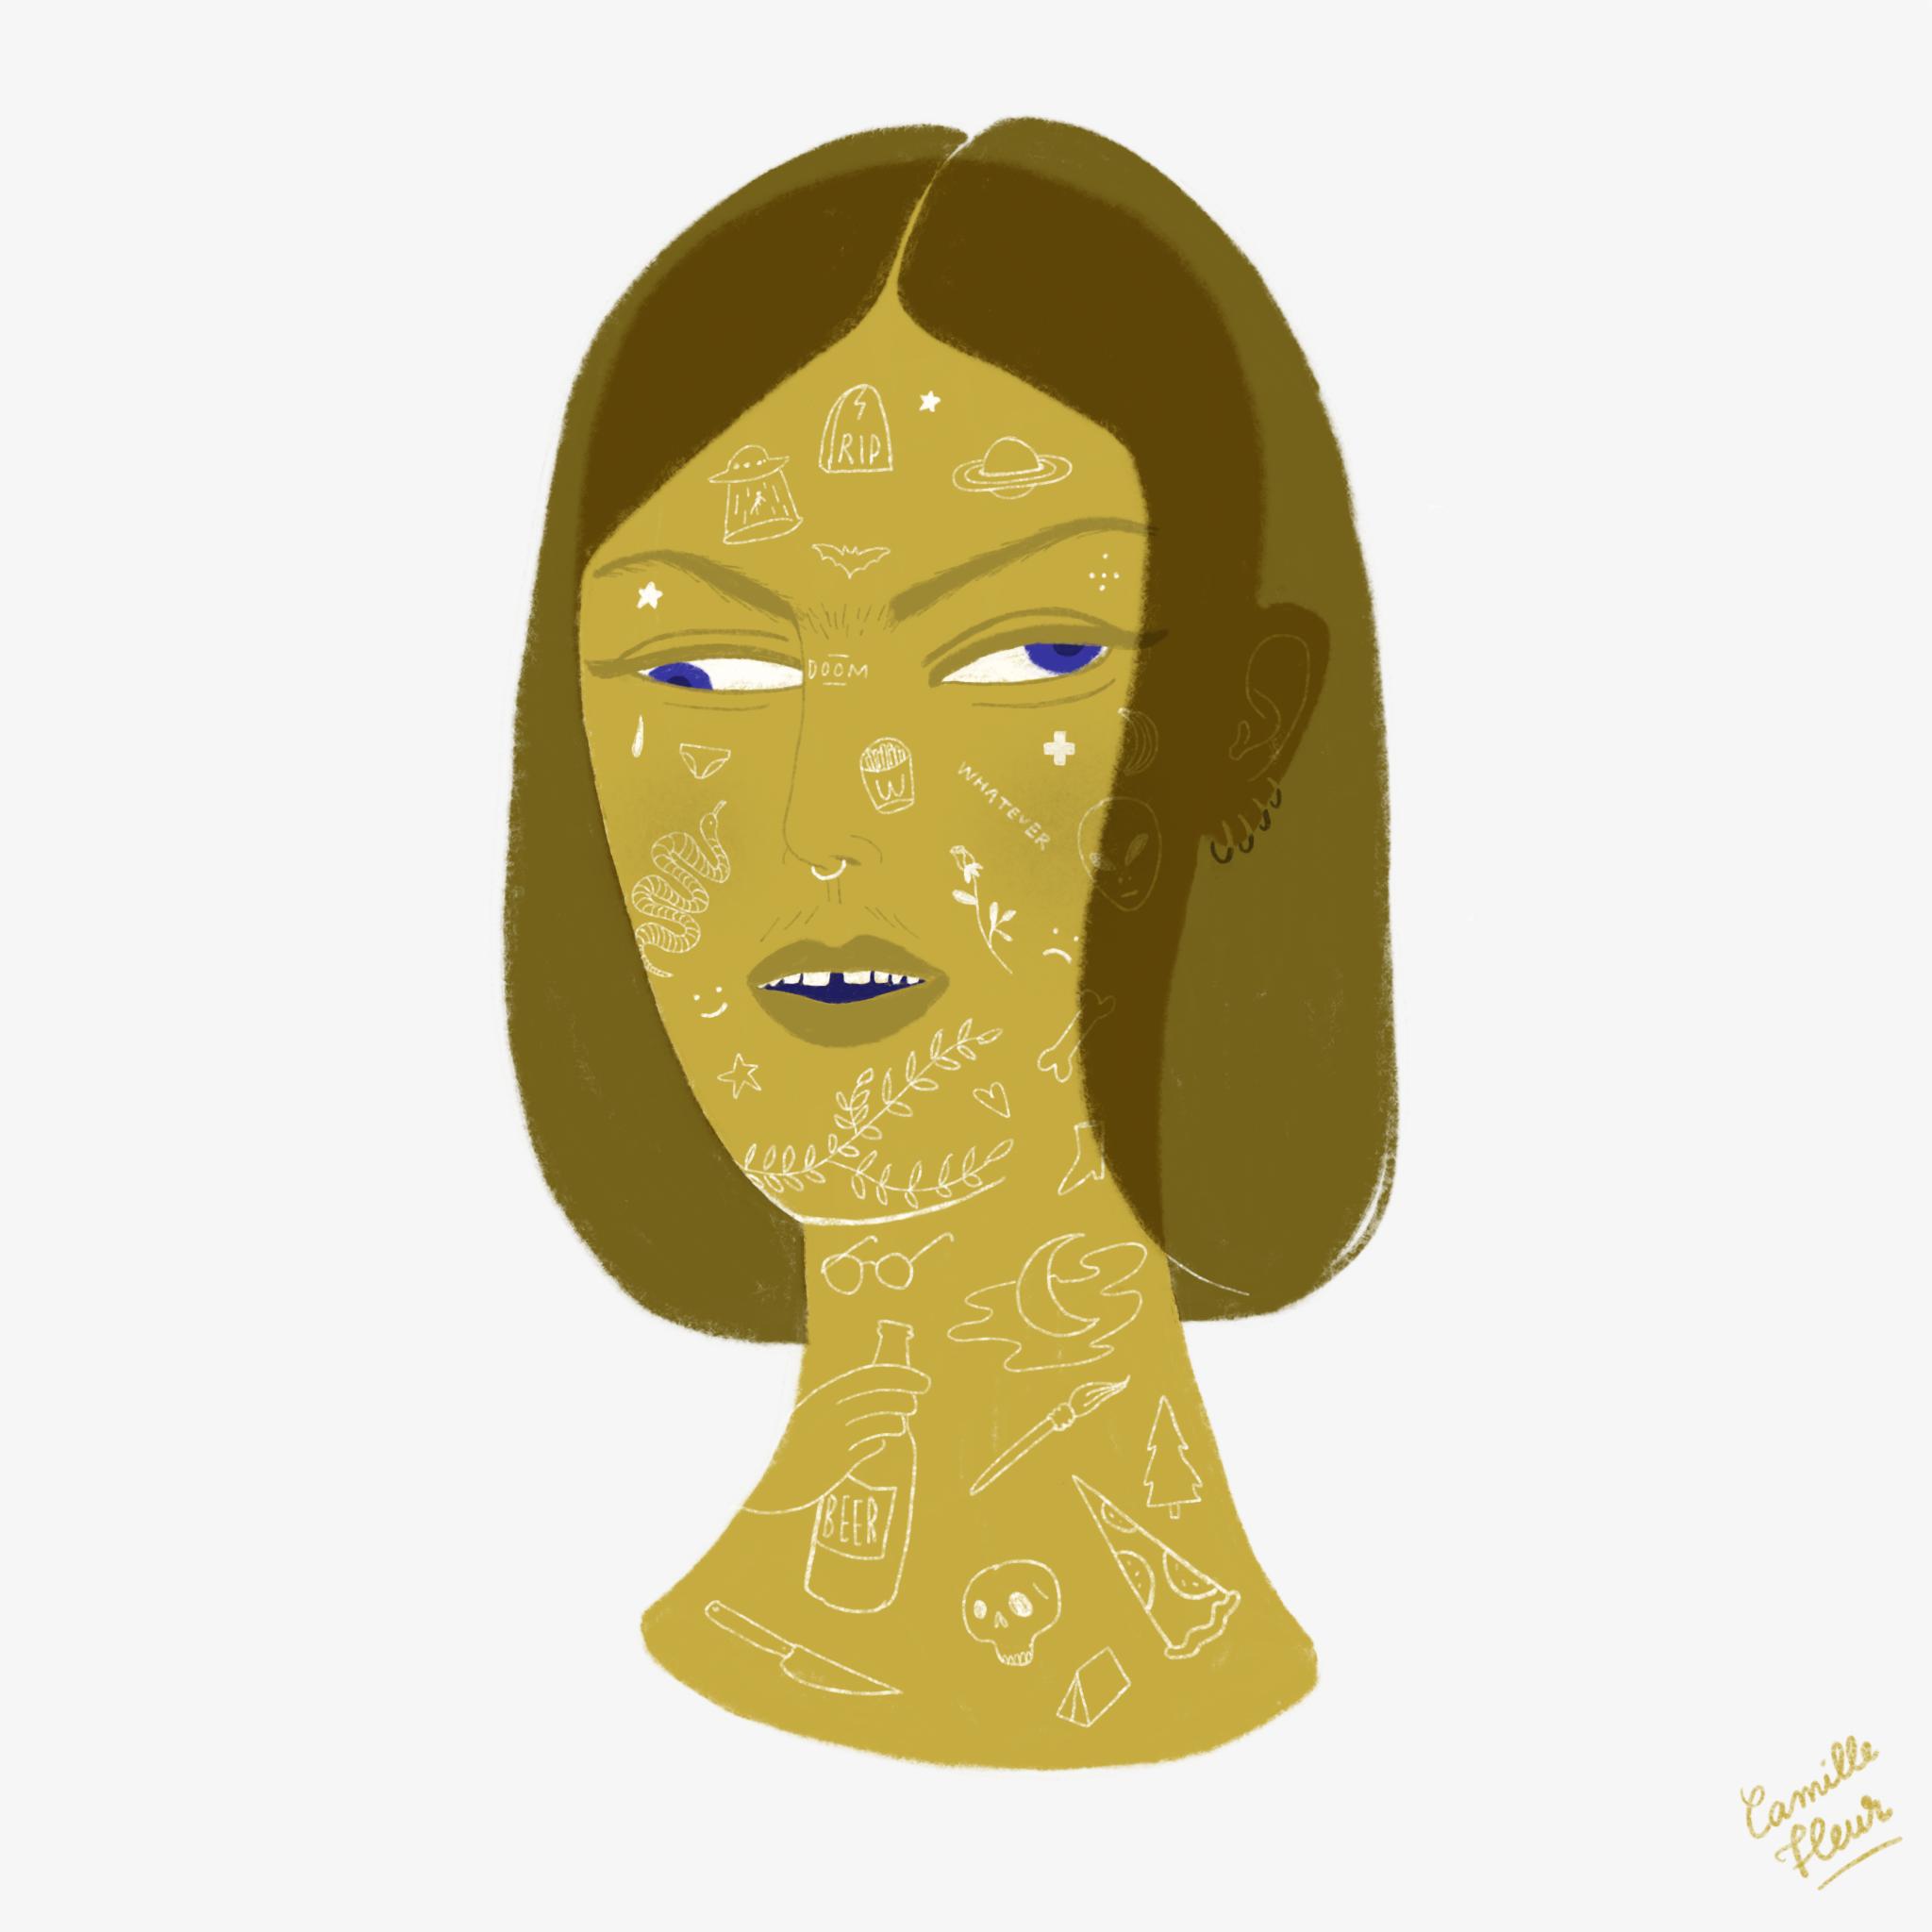 Marceline.